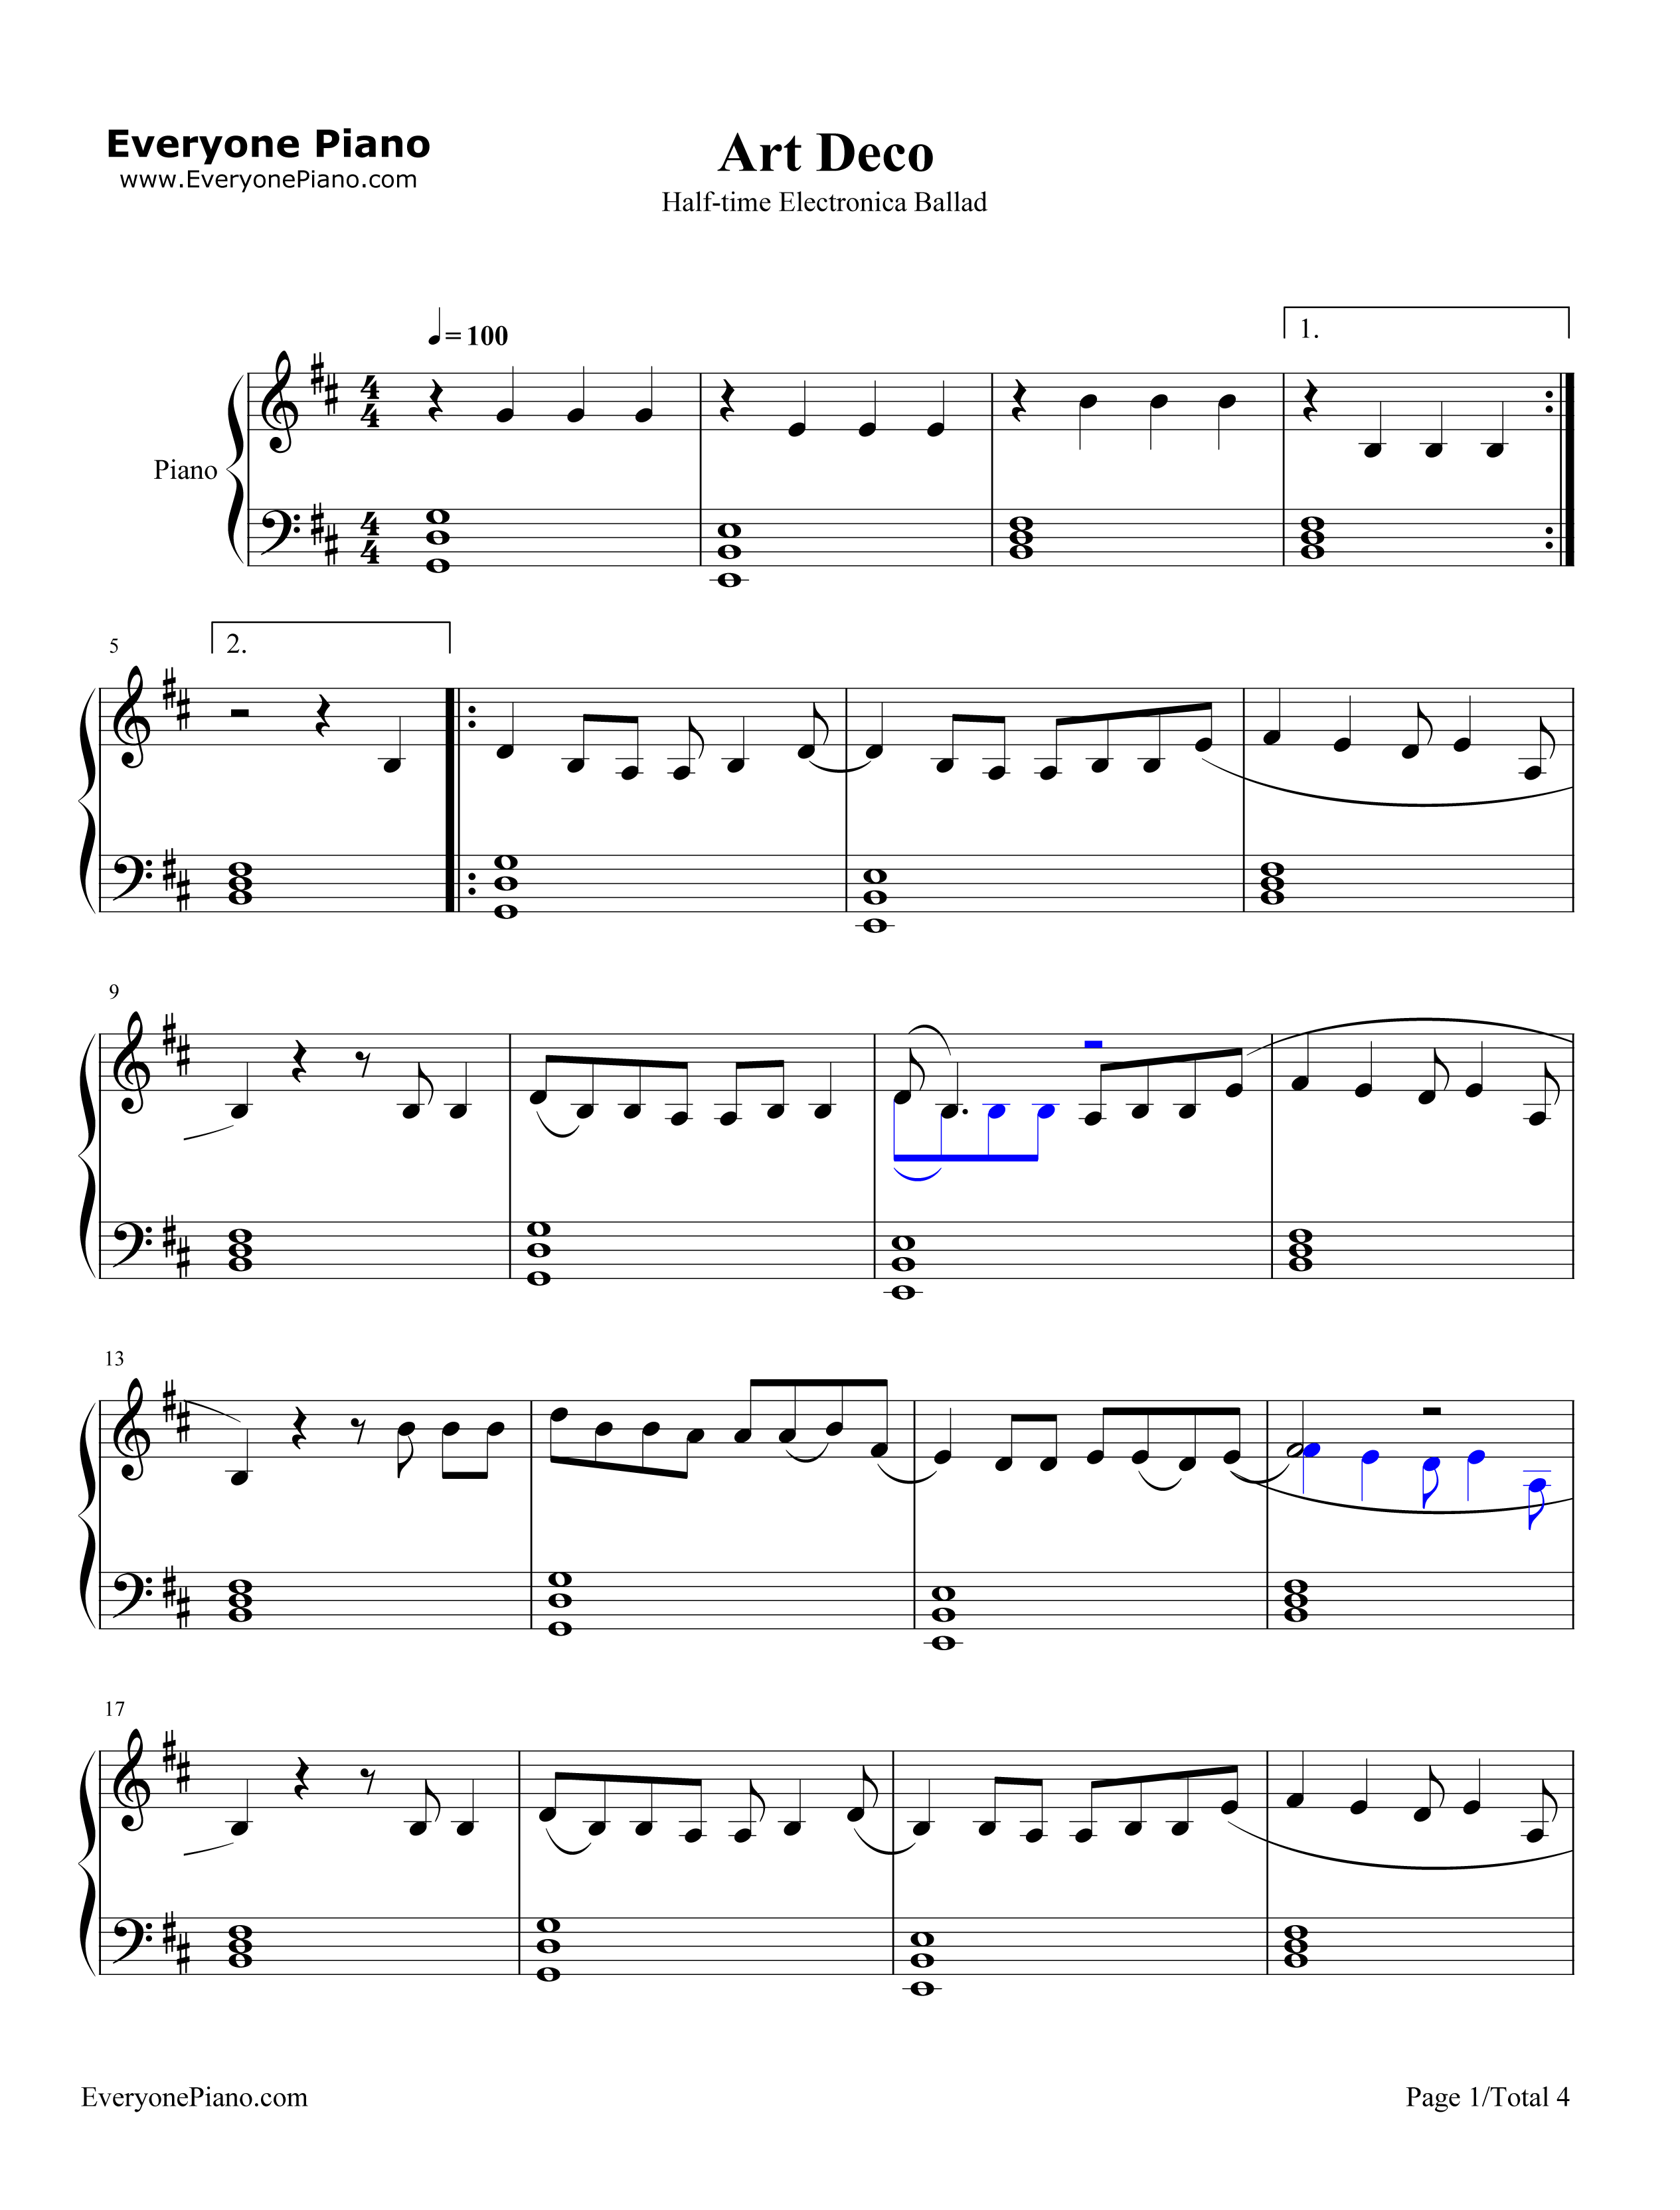 Art deco lana del rey stave preview 1 free piano sheet for Art deco lana del rey